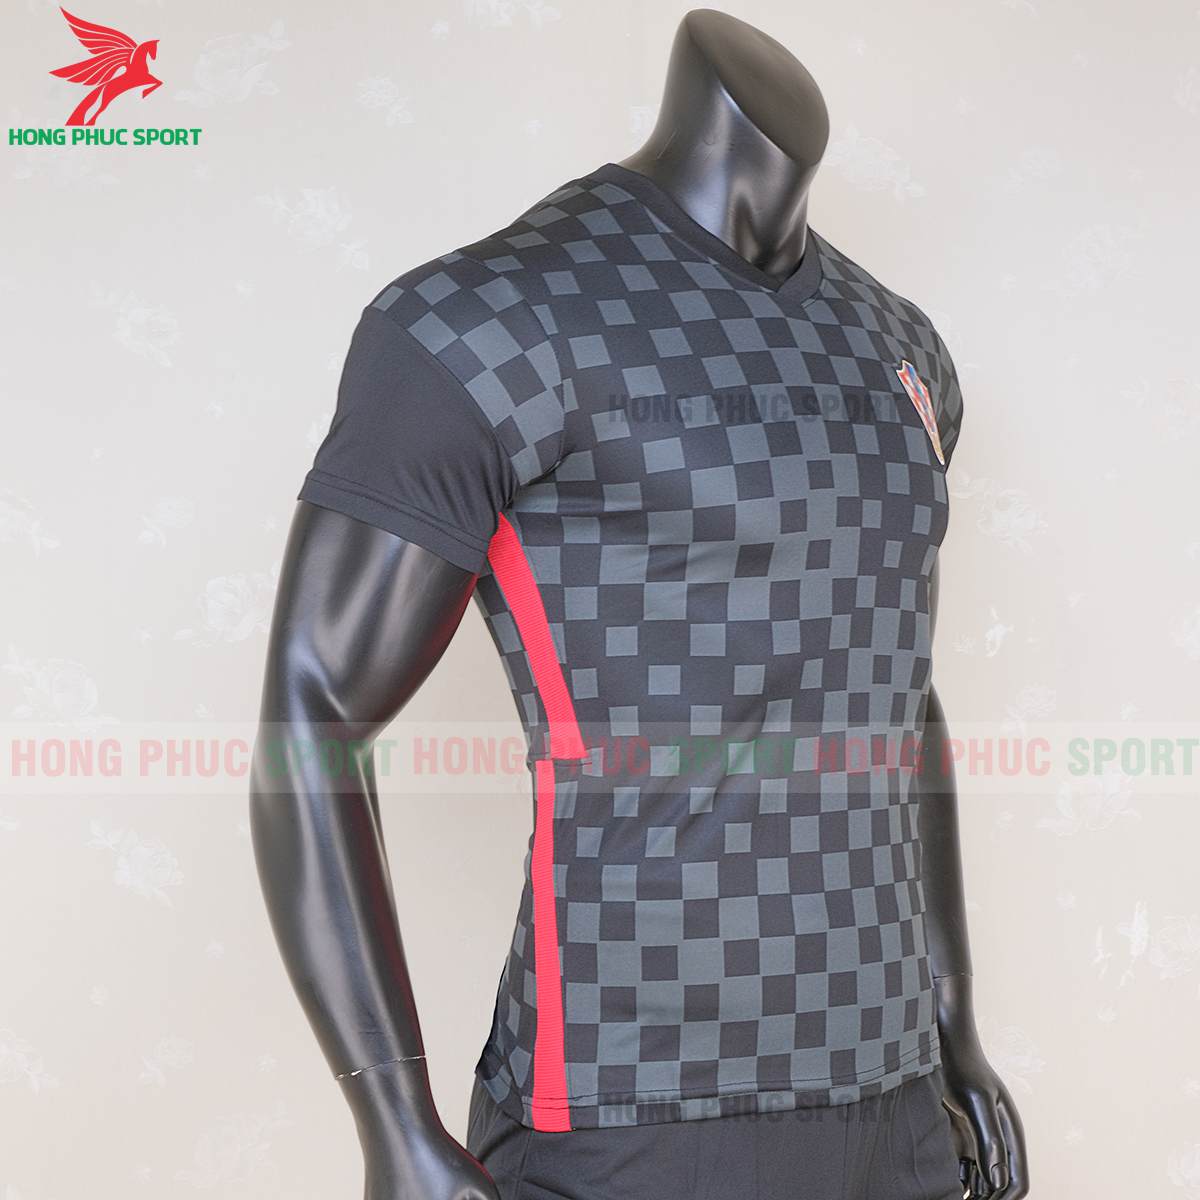 https://cdn.hongphucsport.com/unsafe/s4.shopbay.vn/files/285/ao-tuyen-croatia-2021-san-khach-2-5f71452042981.png